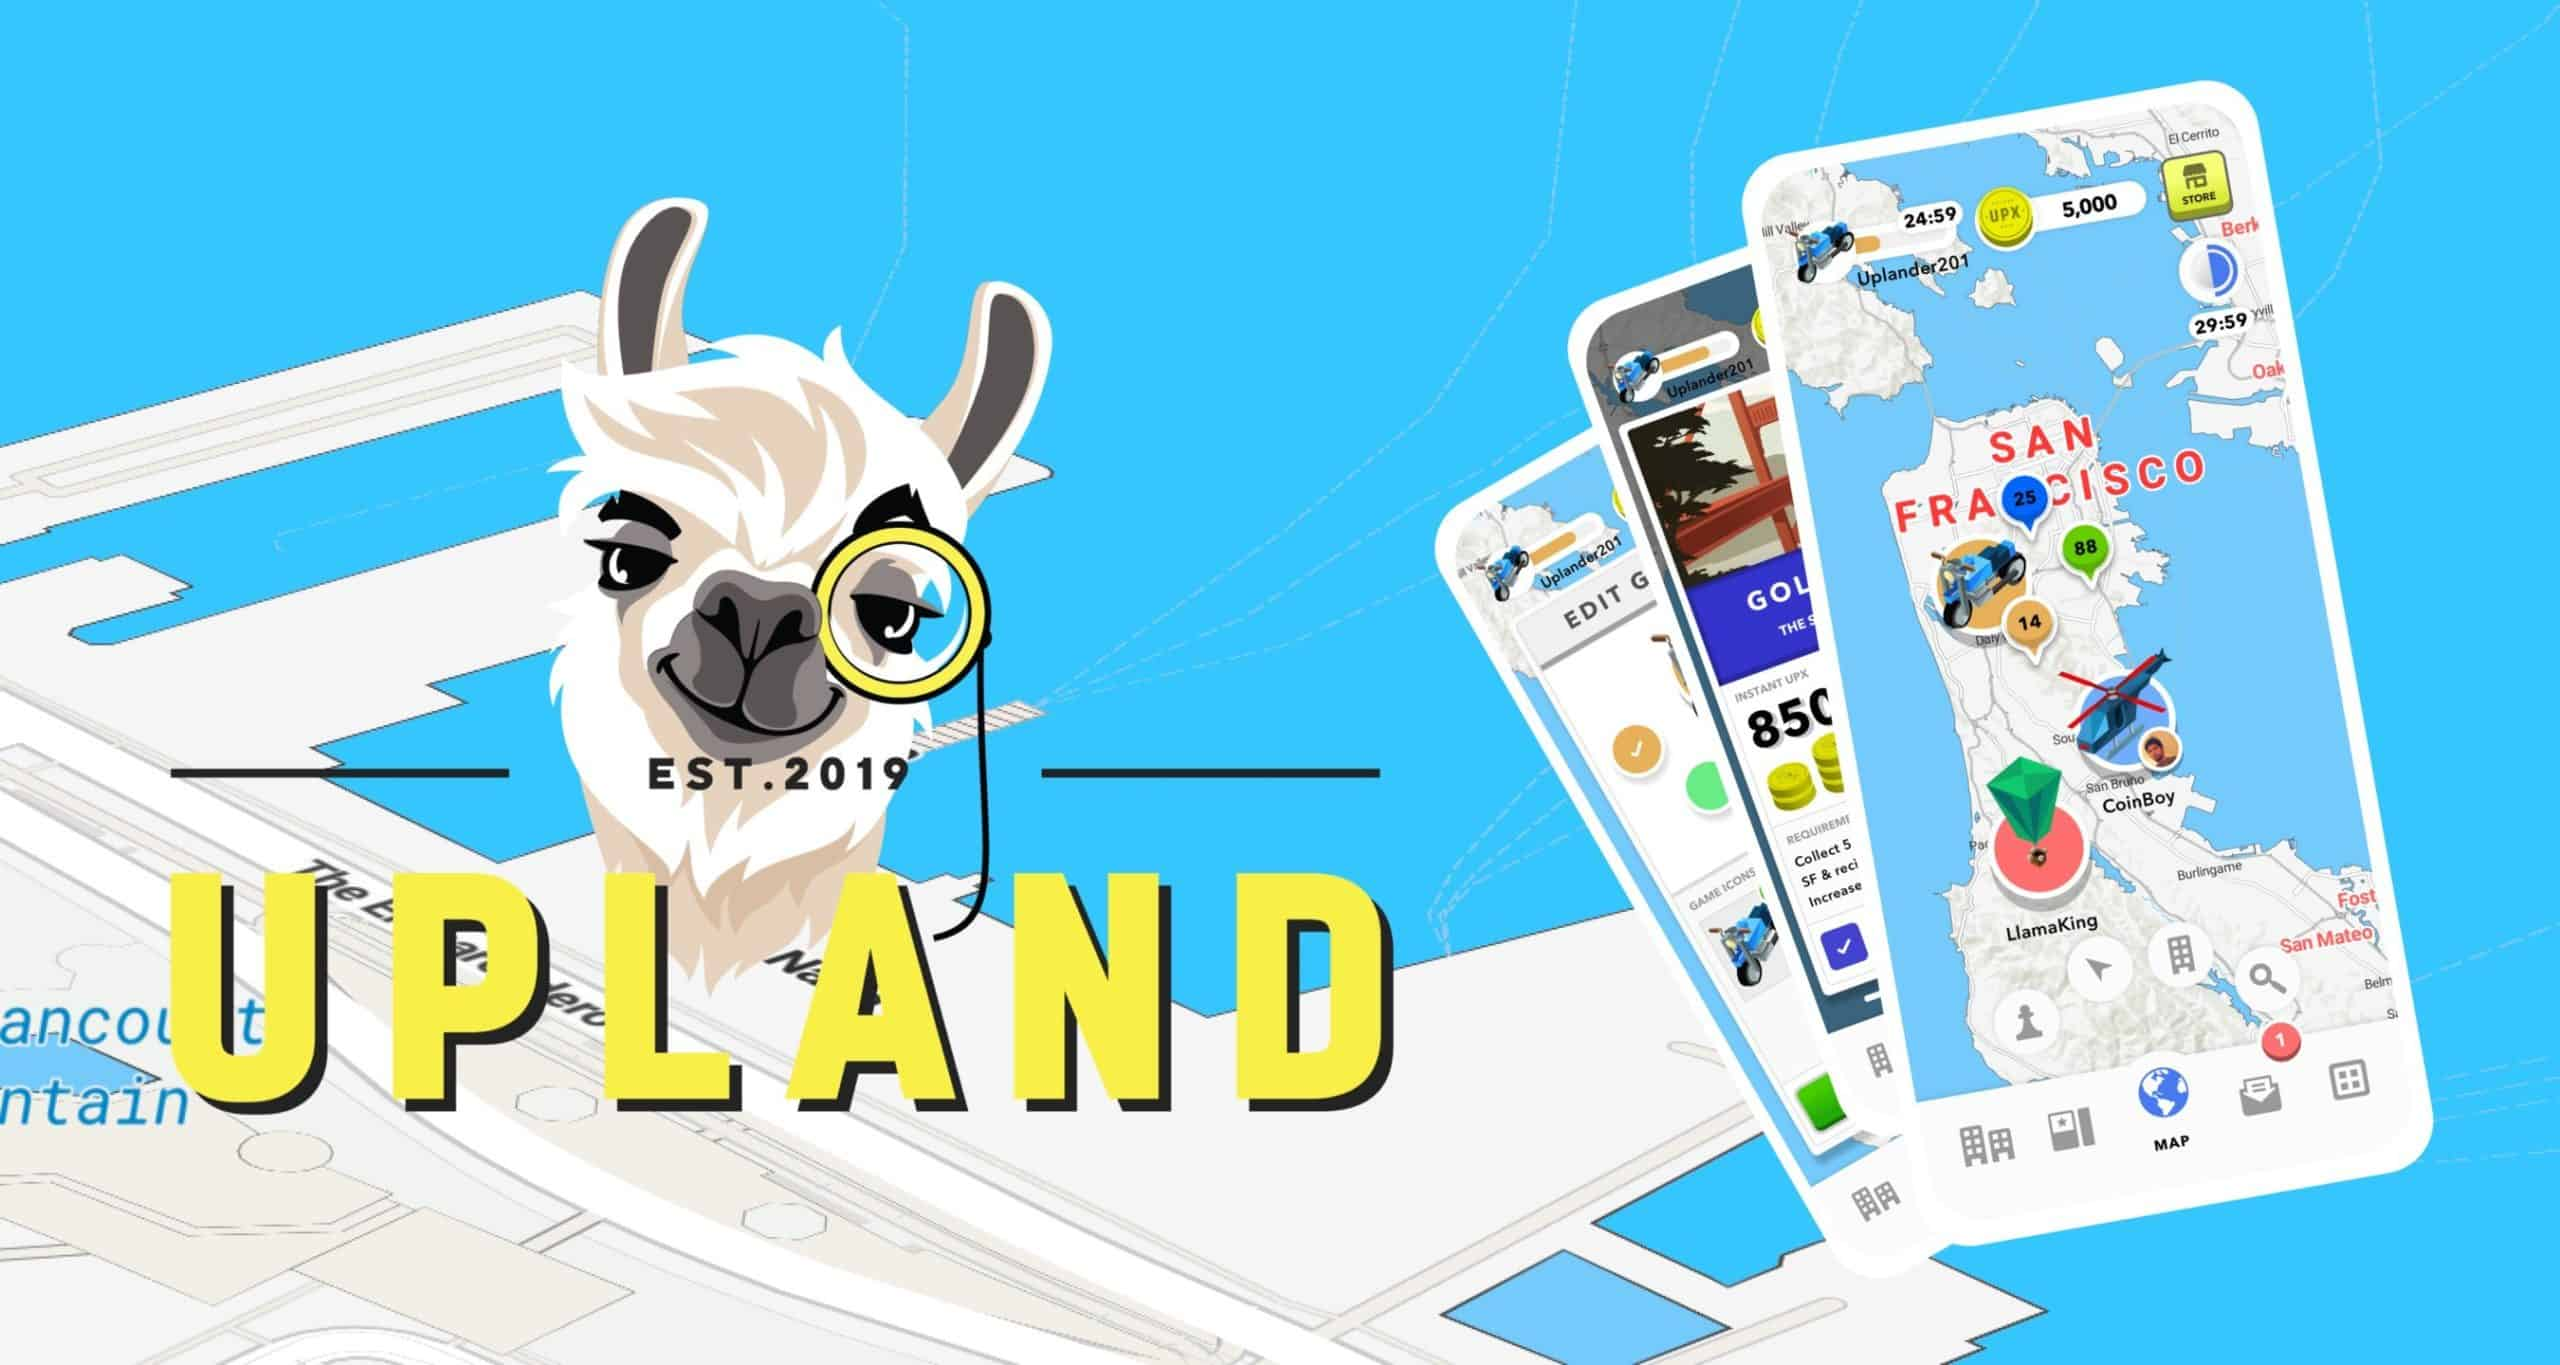 Upland virtual property blockchain game